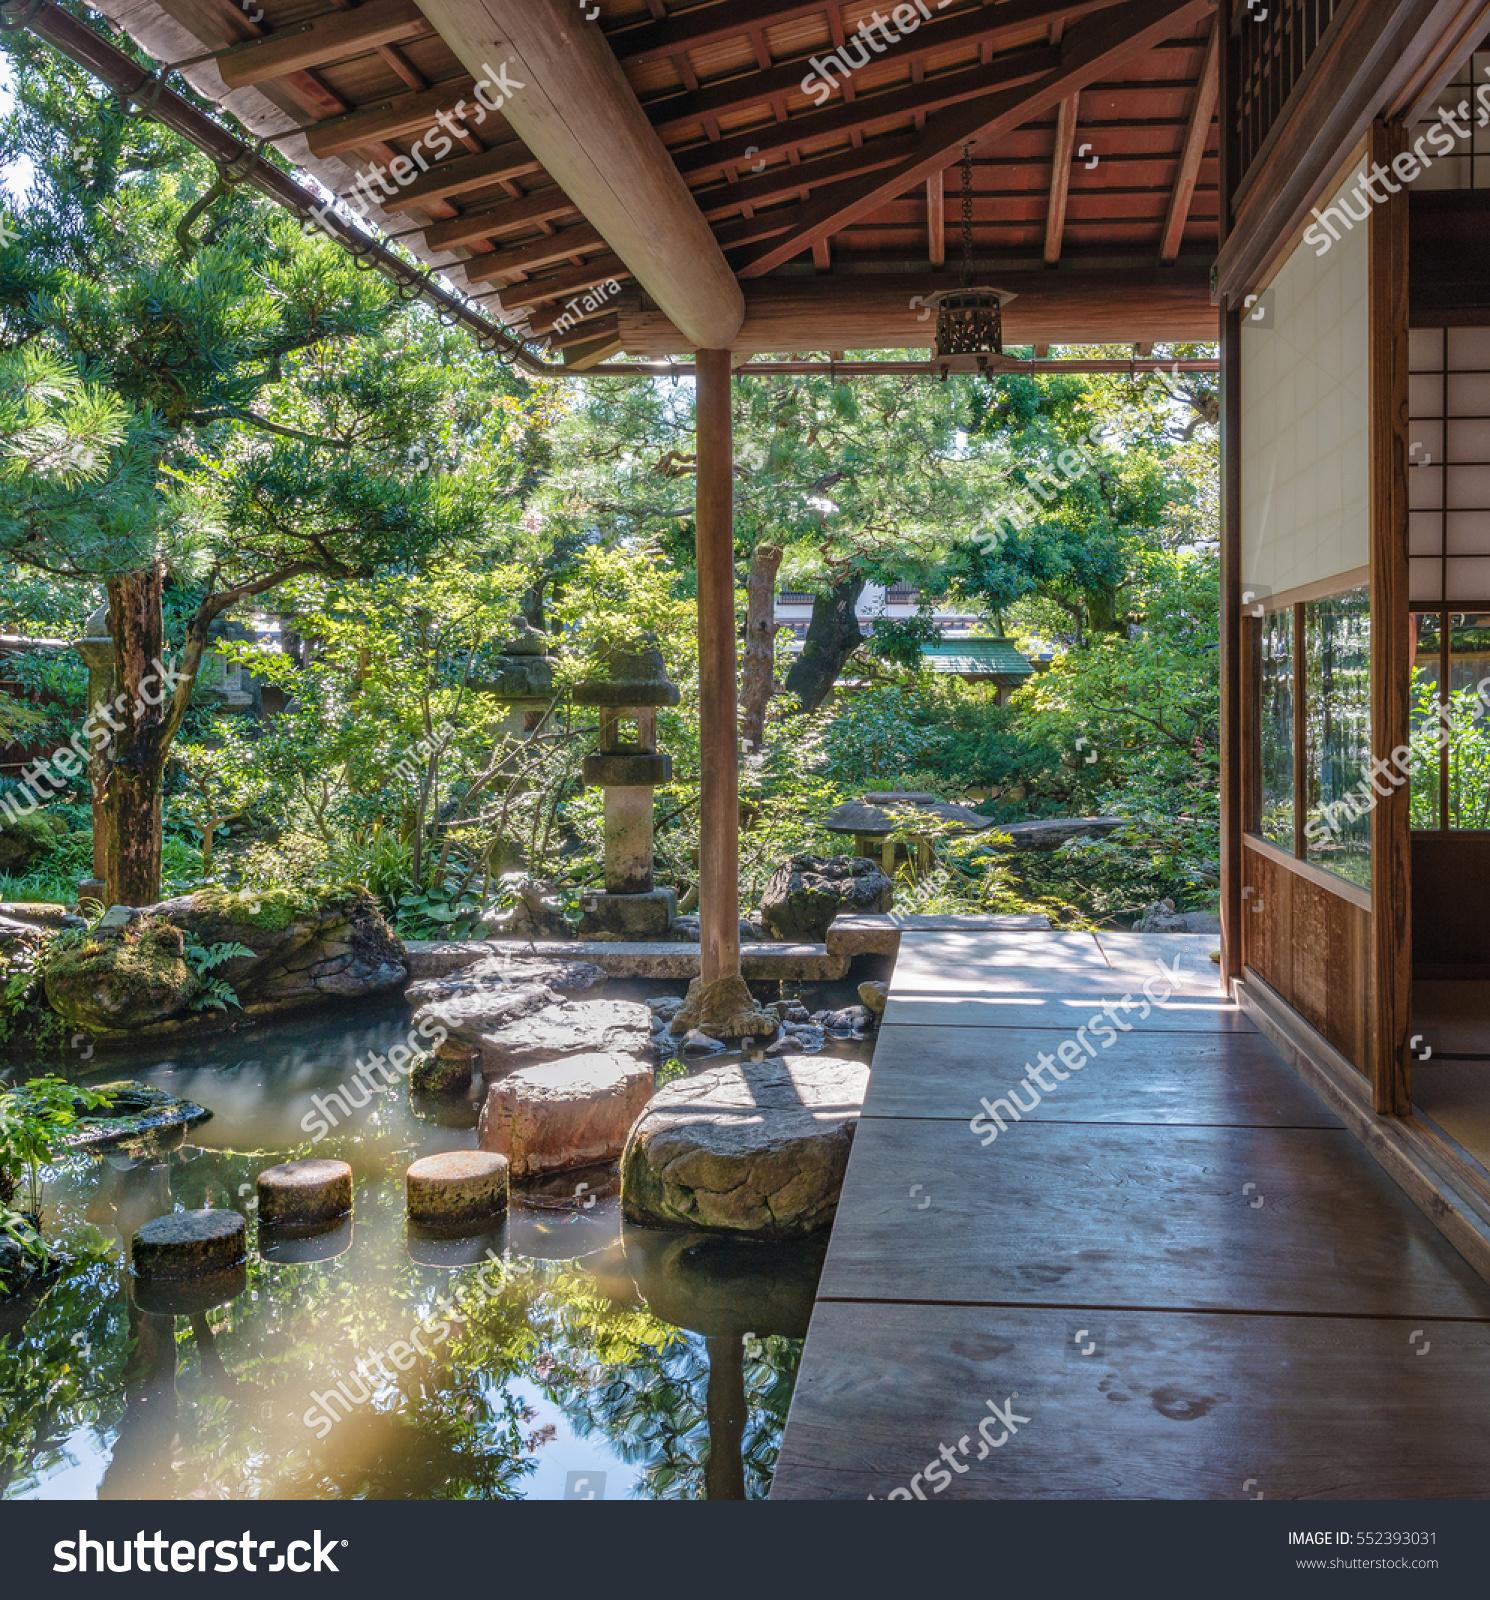 Scenery of the beautiful Japanese garden & Scenery Beautiful Japanese Garden Stock Photo (Edit Now) 552393031 ...